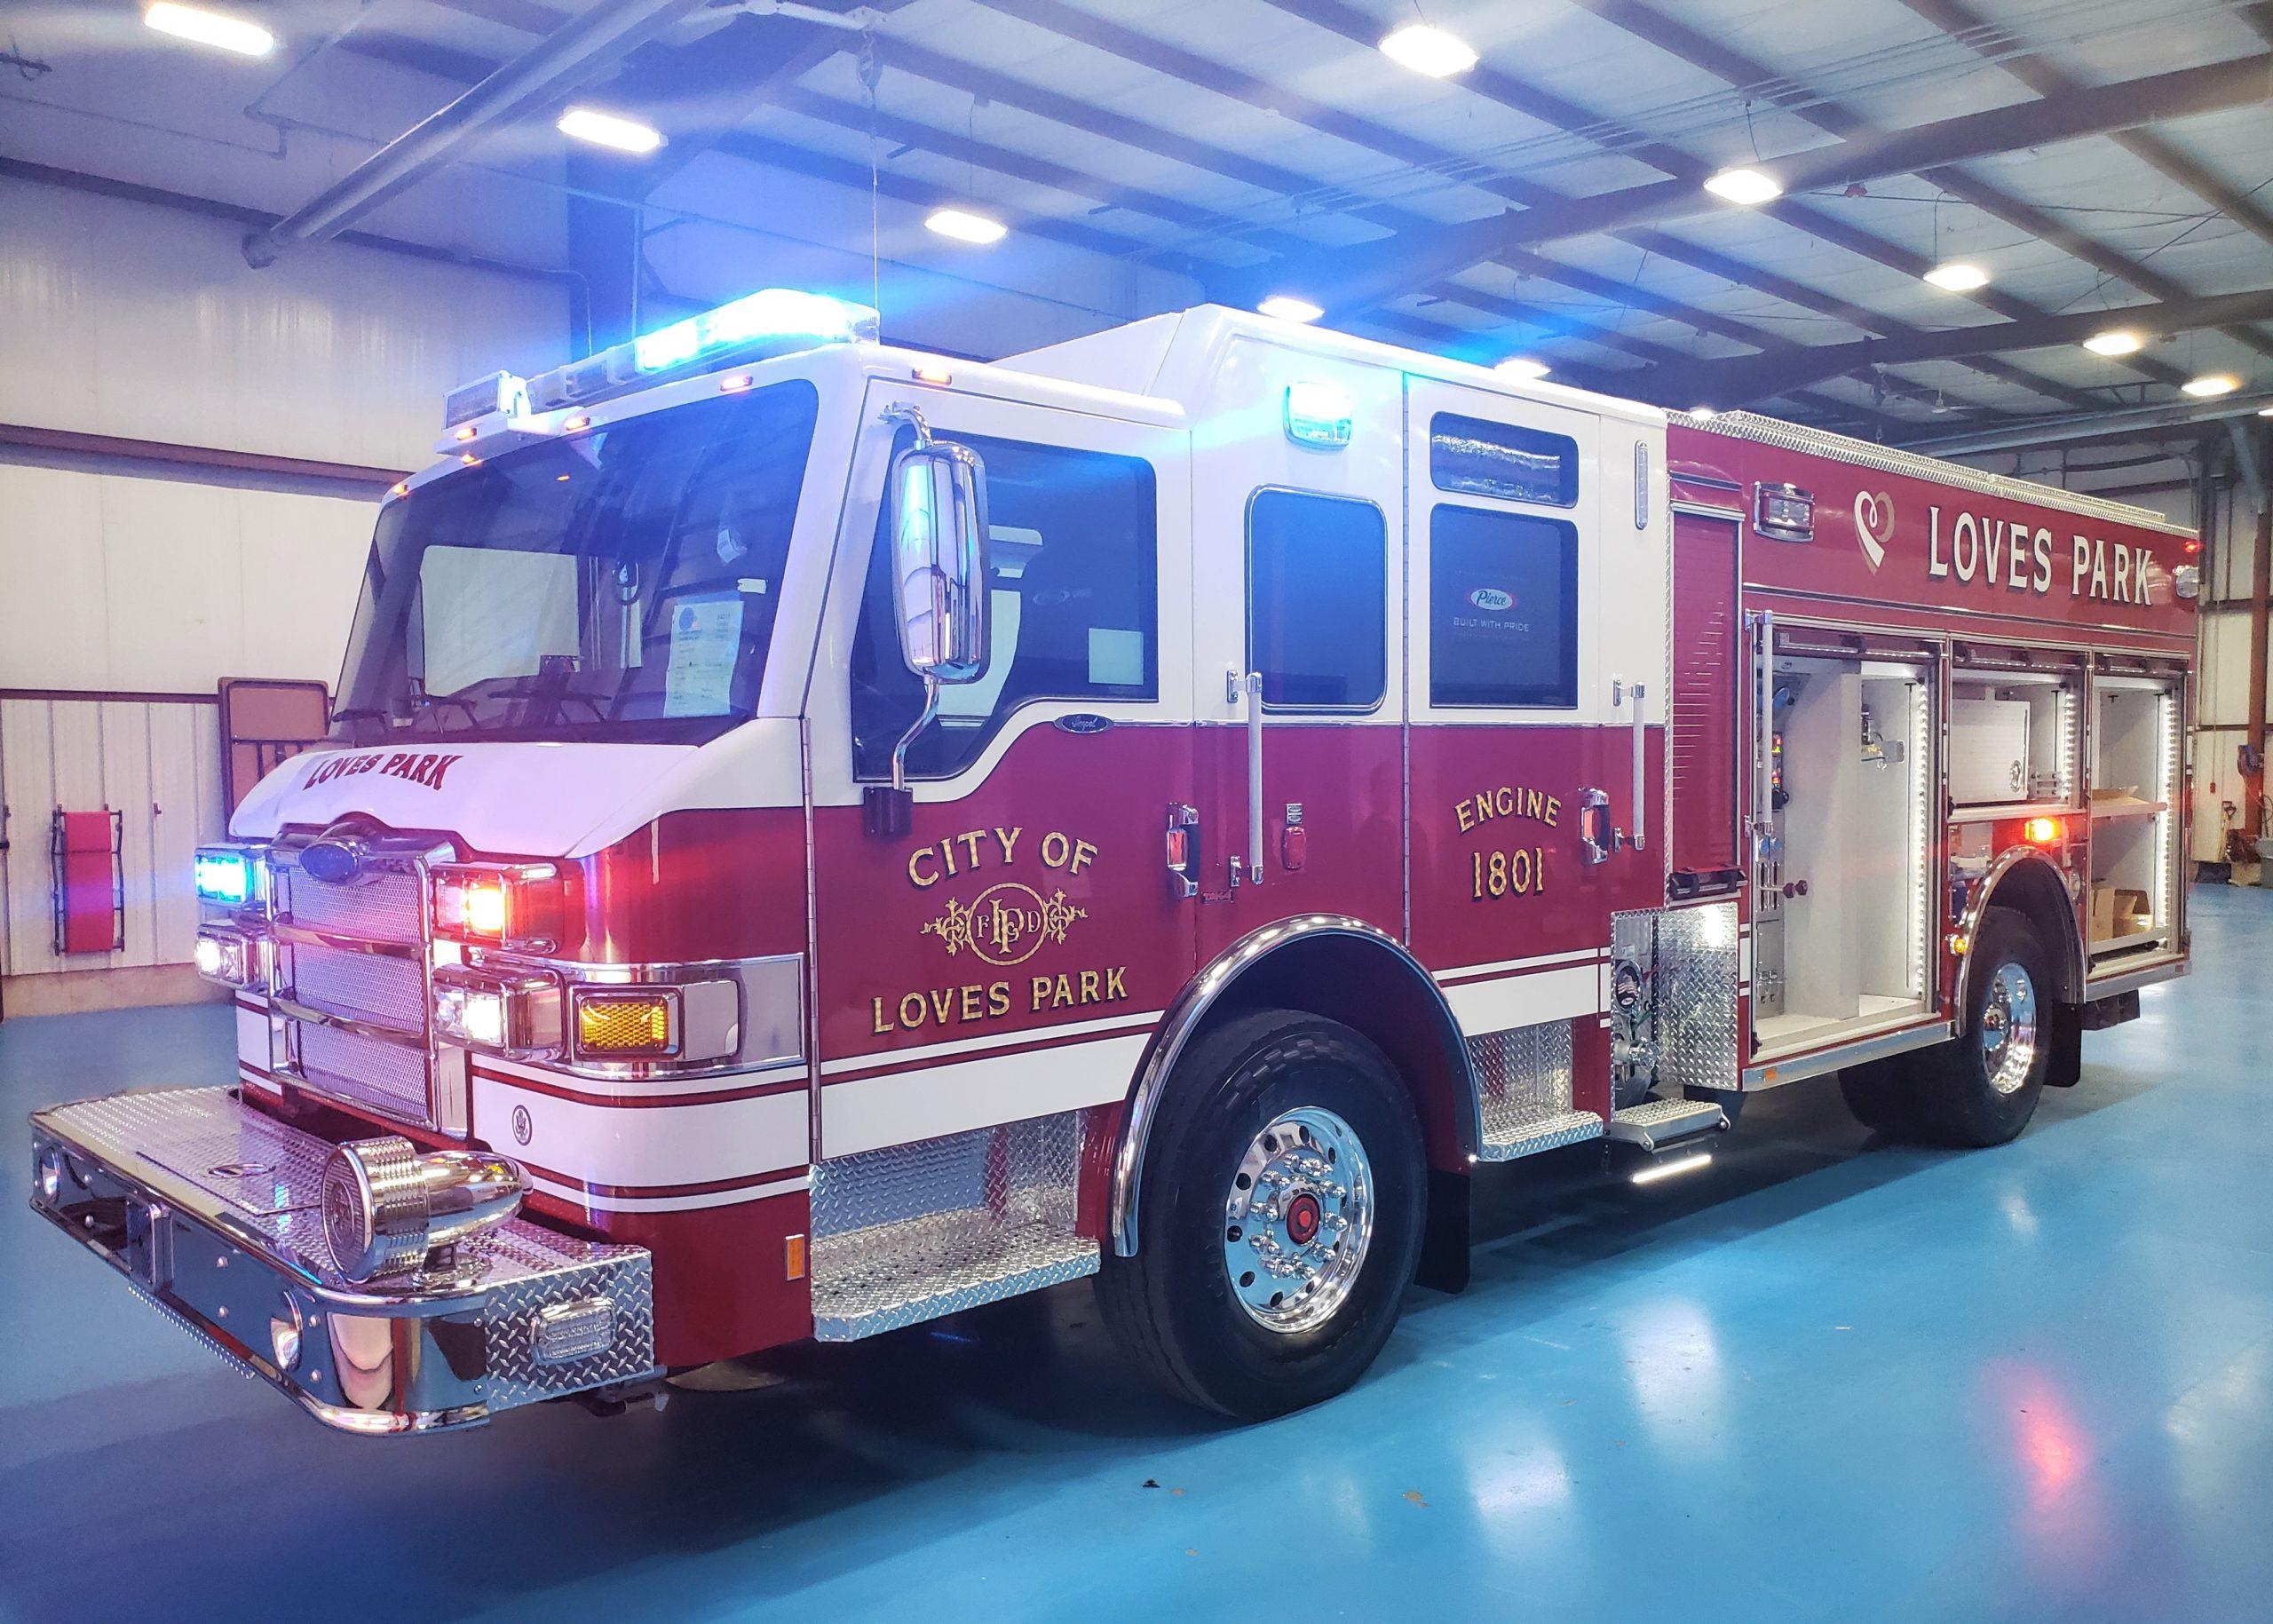 City of Loves Park Fire Department - Pumper